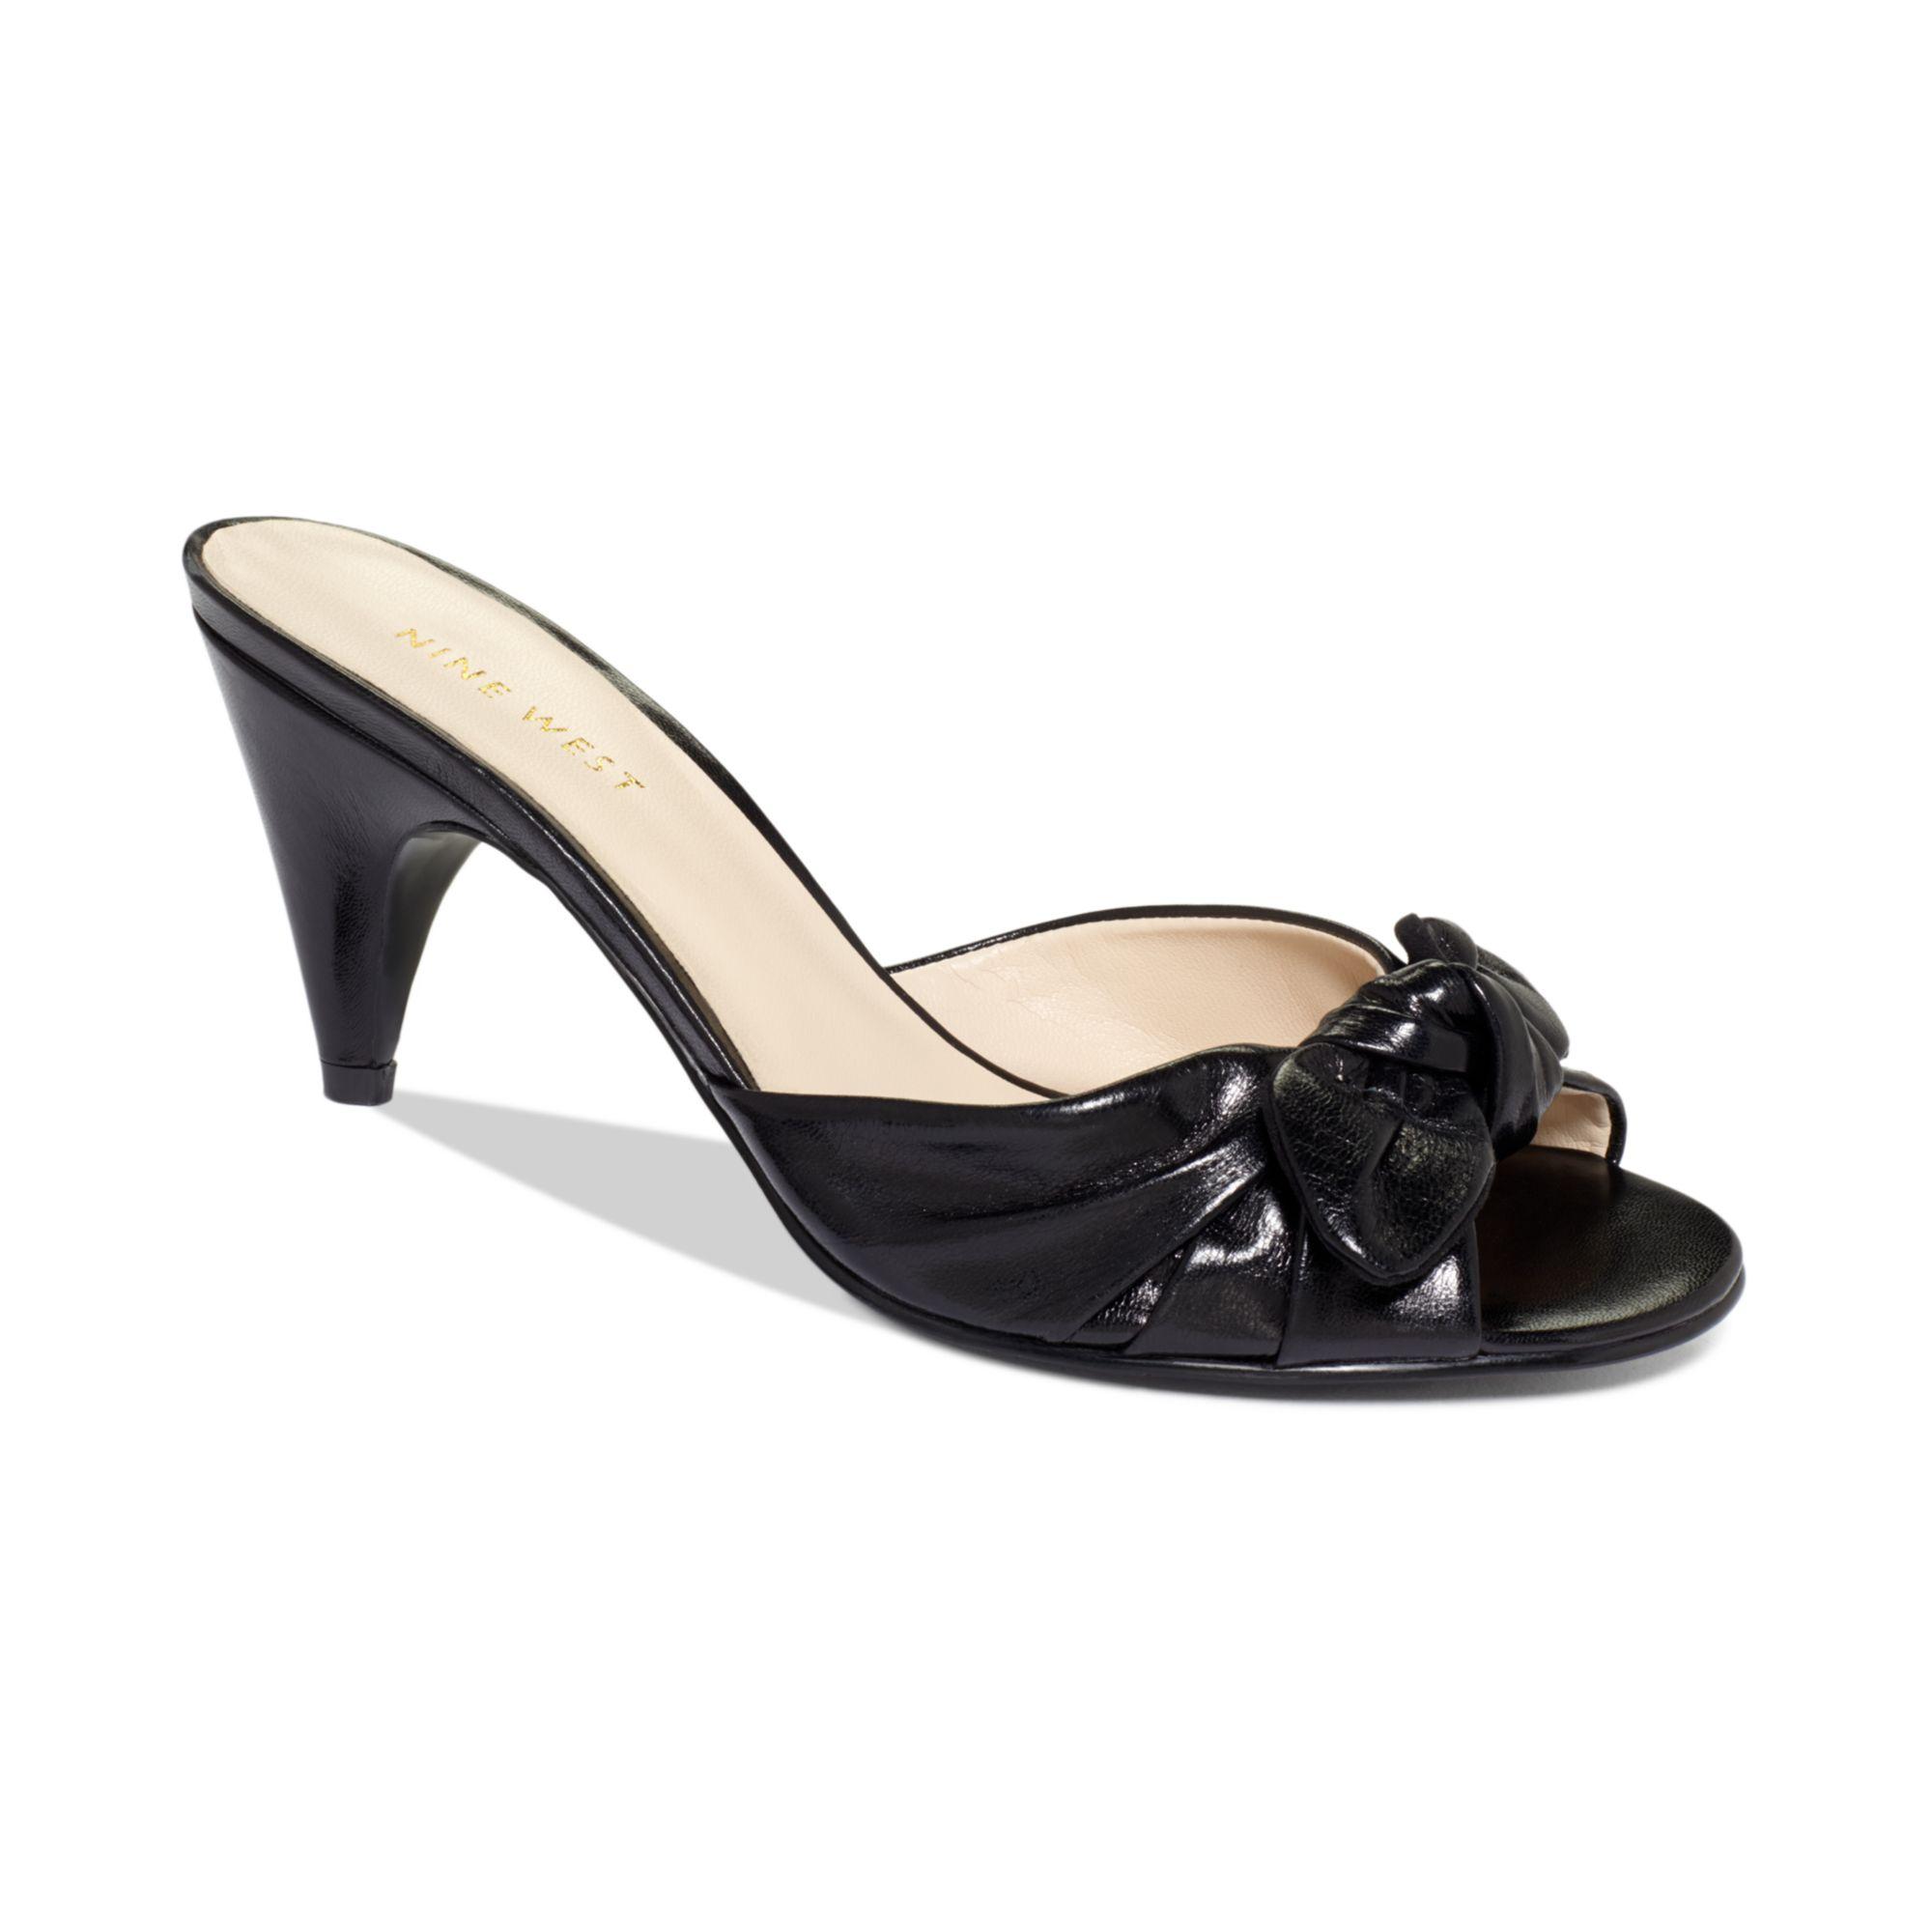 336750f5f9c Lyst - Nine West Anesa Mid Heel Mules in Black